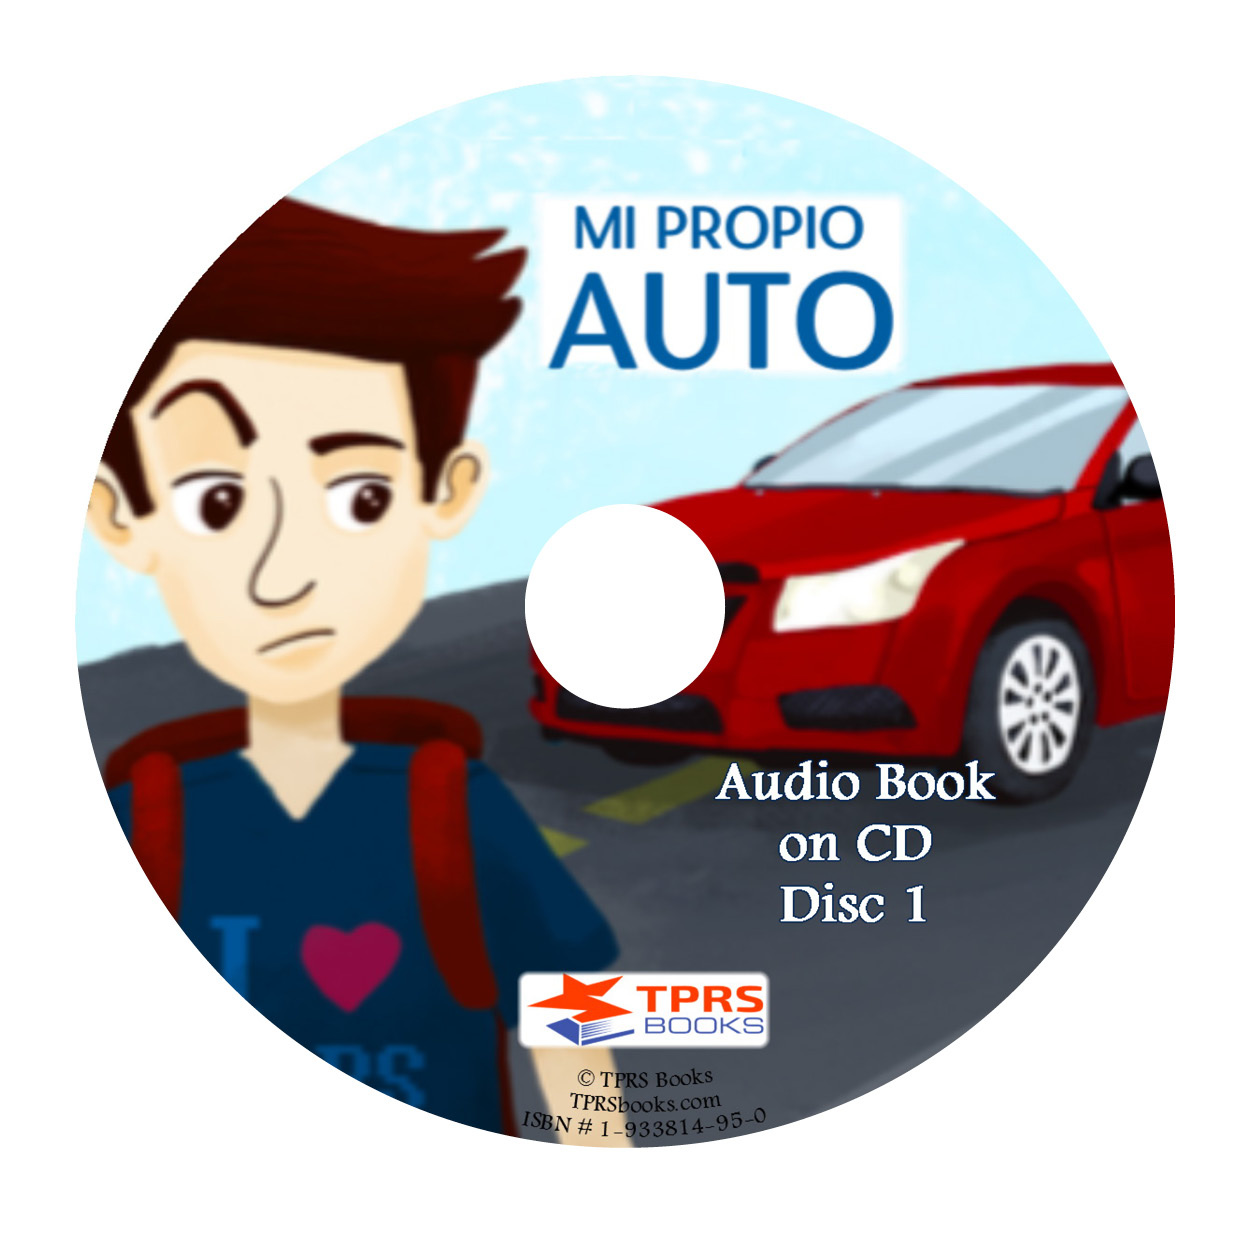 Mi propio auto - Audiobook